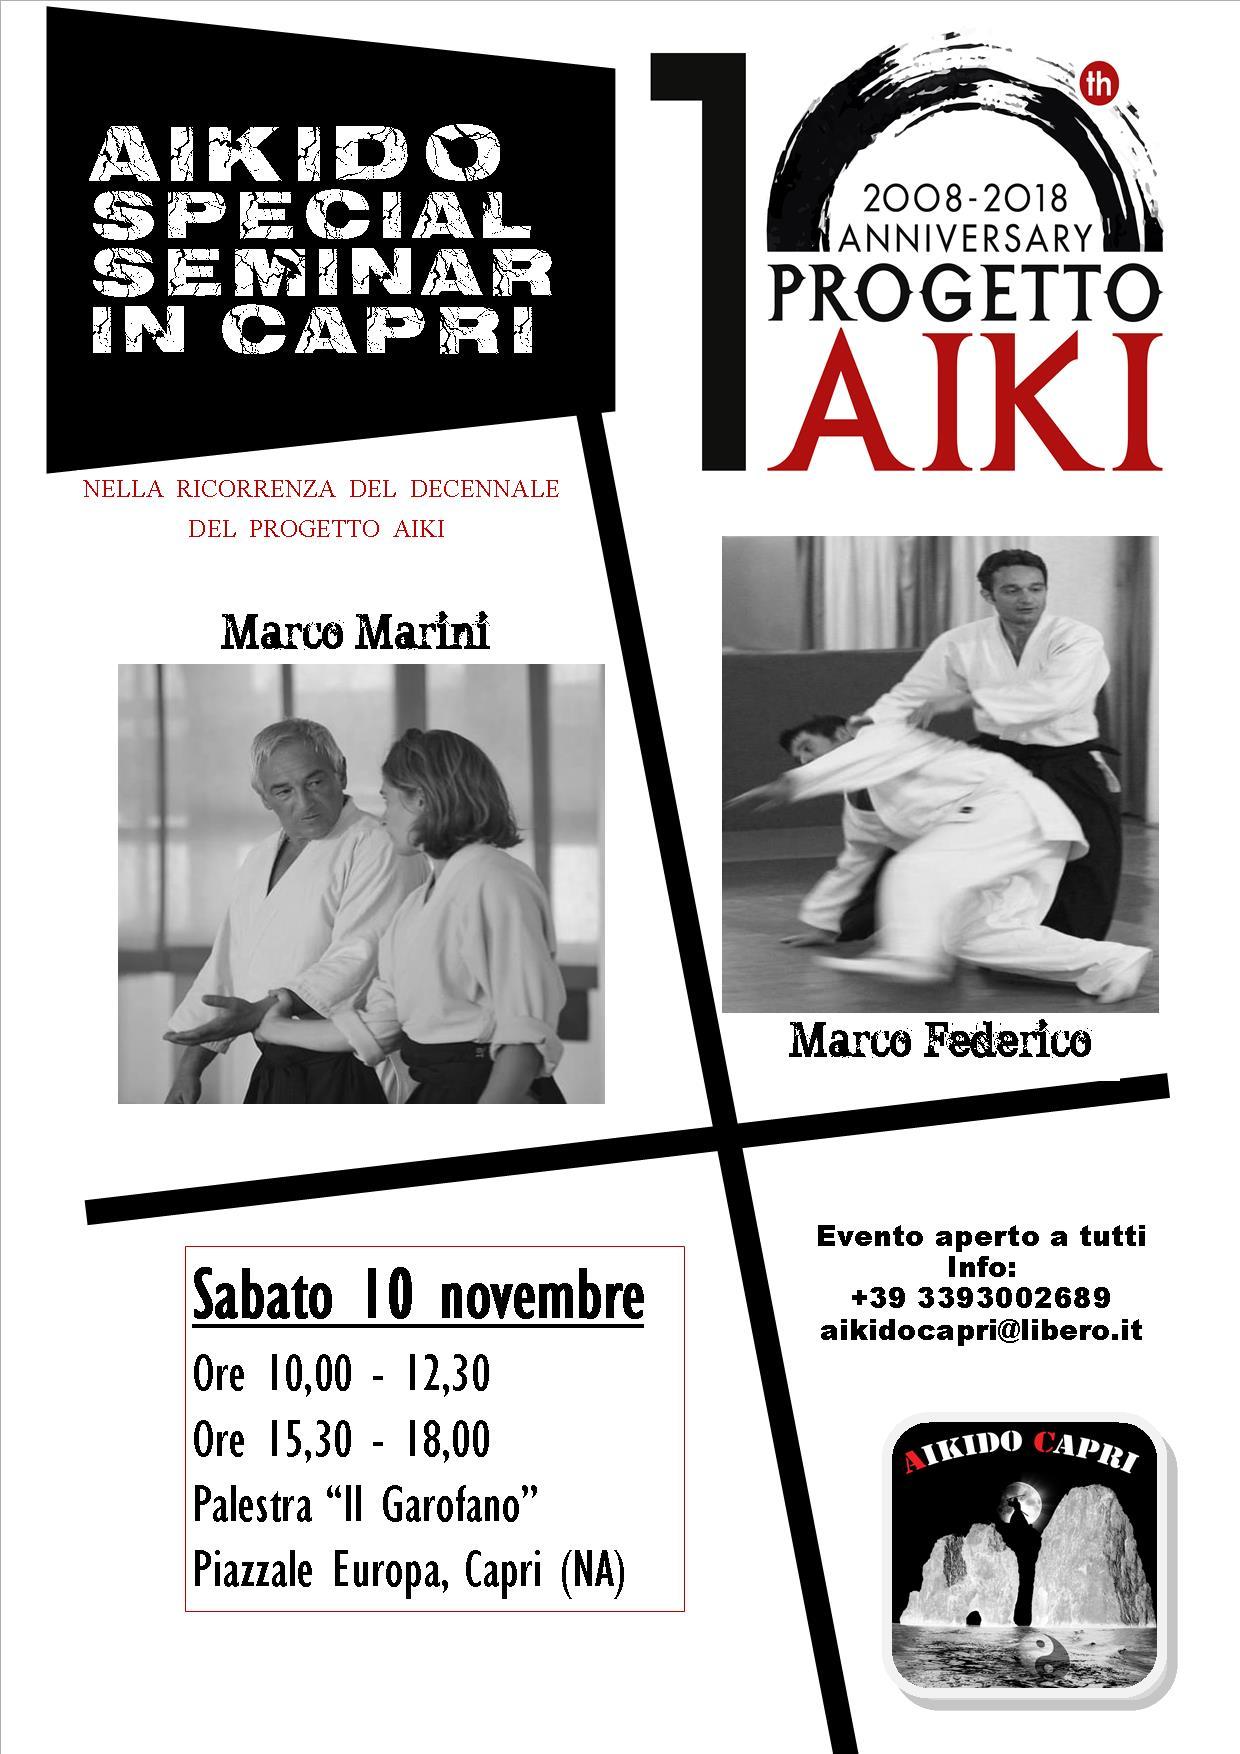 Stage di Aikido, Marco Marini, Marco Federico, Aikido 2000, Aikido Capri